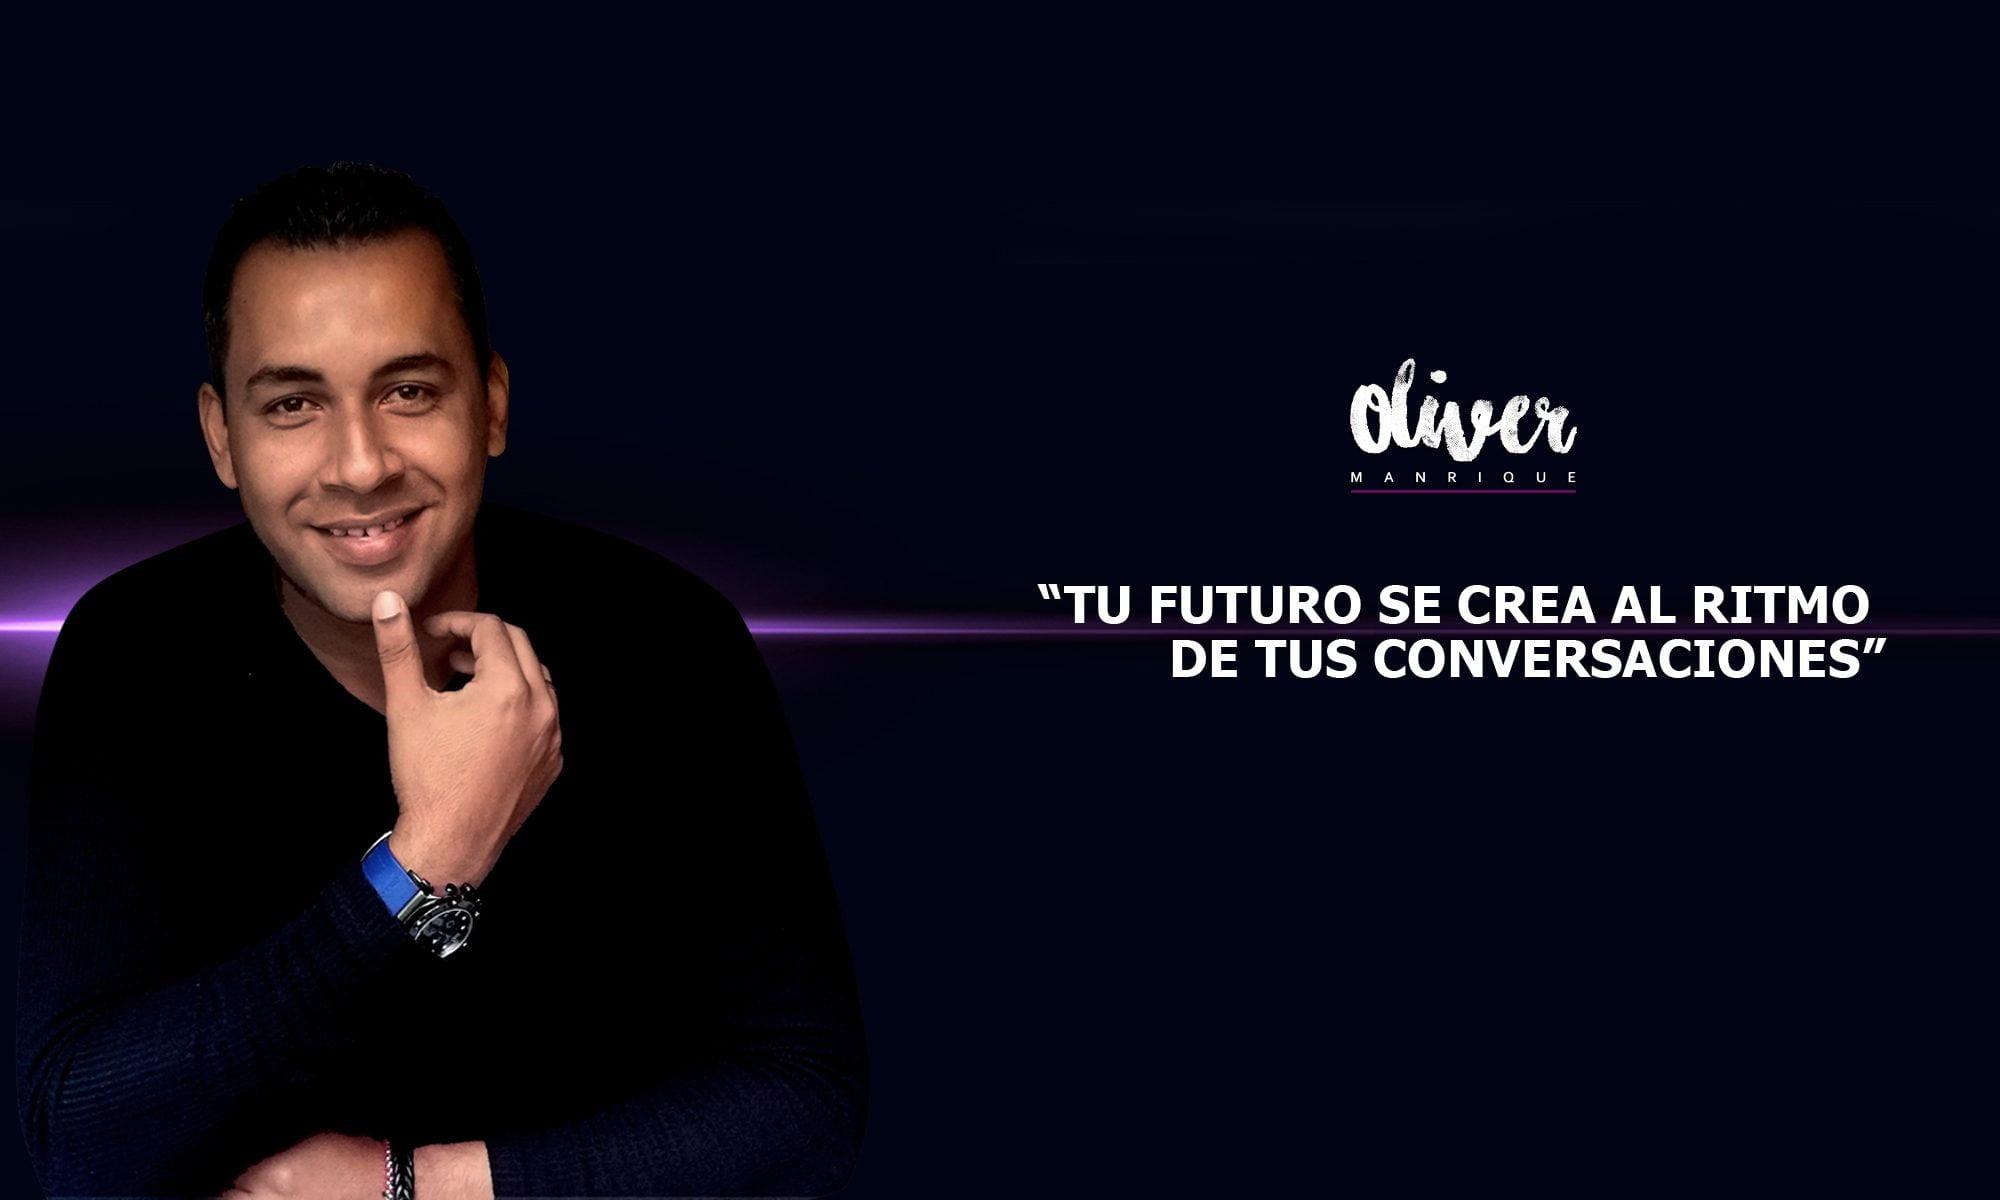 Oliver Manrique